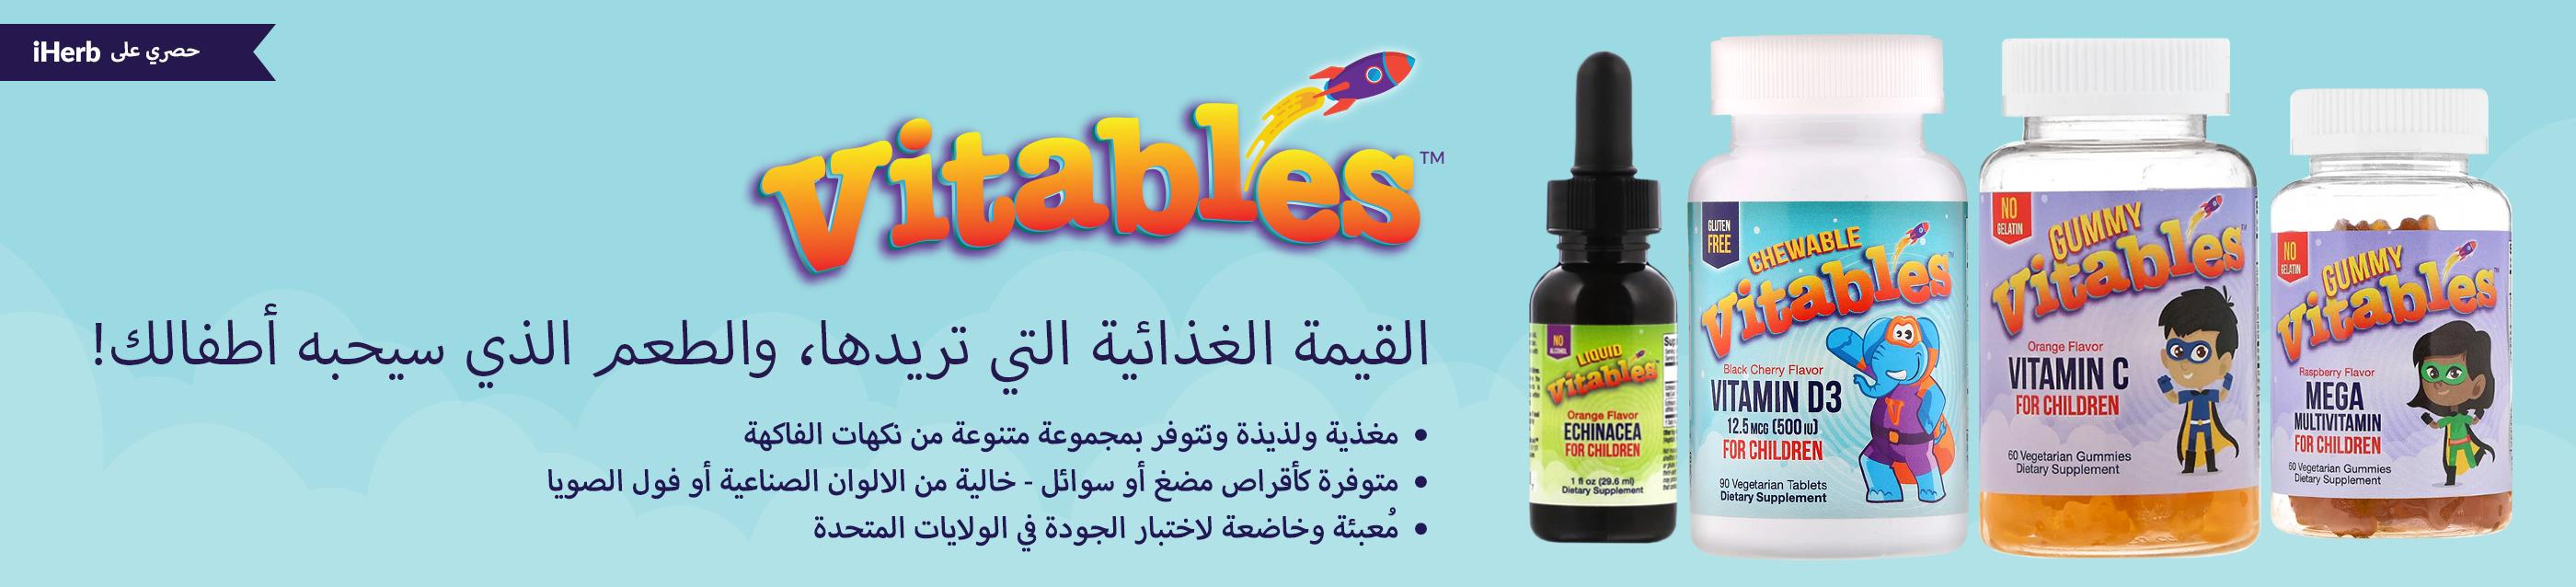 Vitables